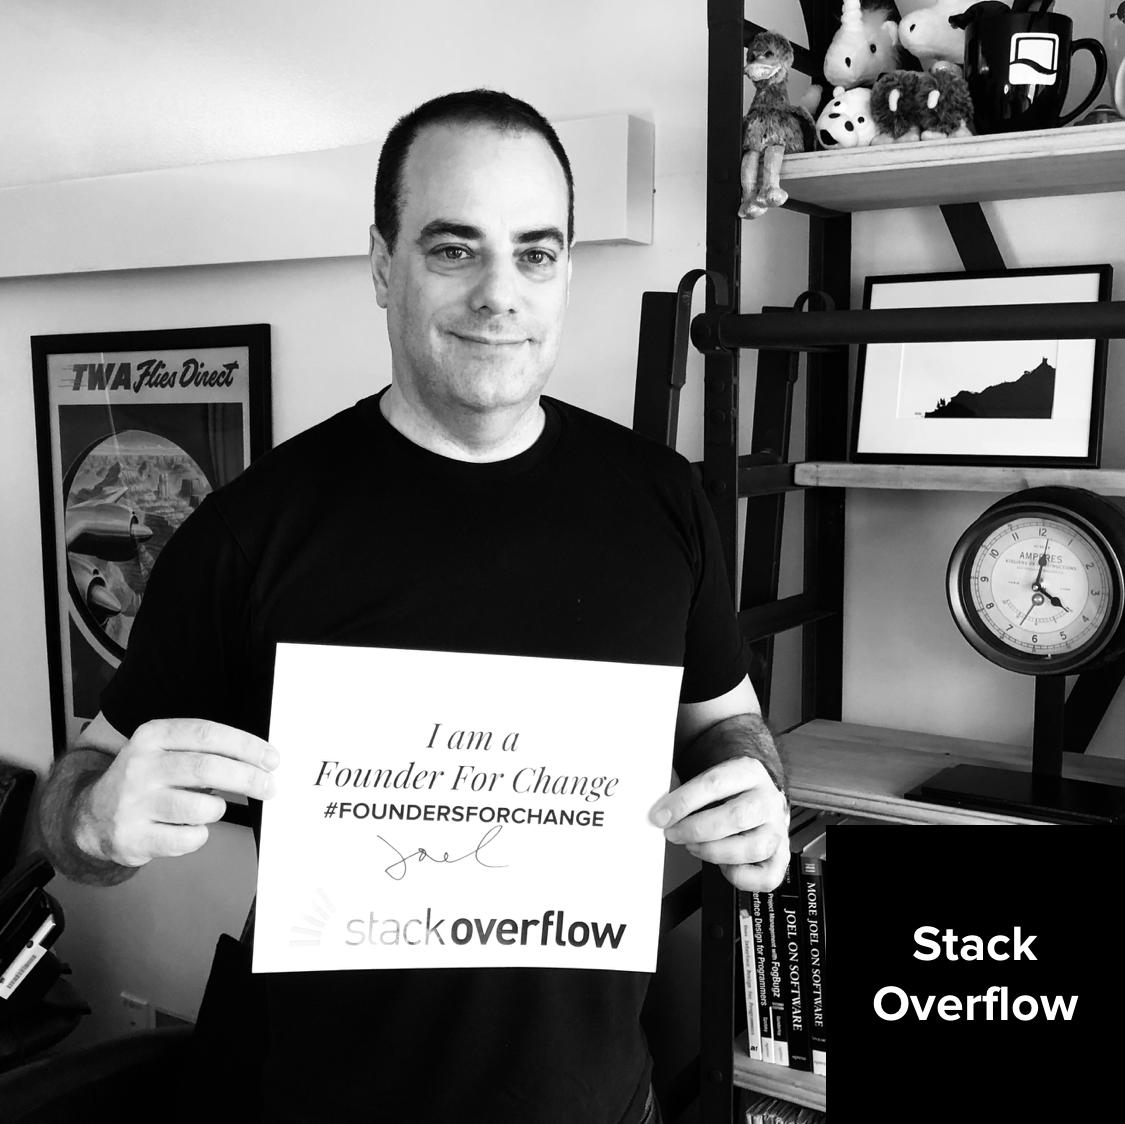 StackOverflow_JoelSpolsky.png